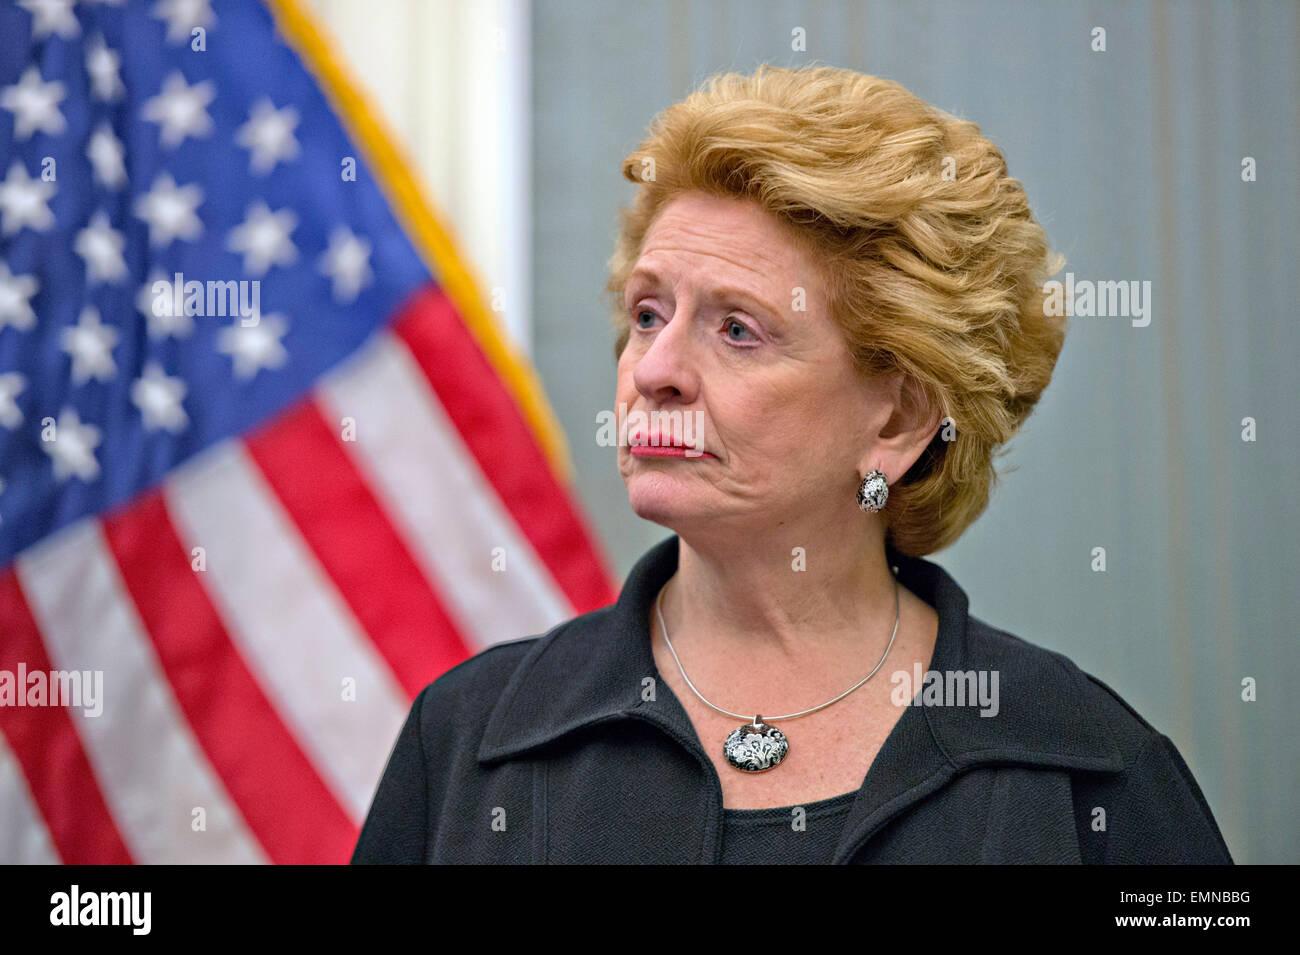 US Democratic Senator Debbie Stabenow joins other Senators for a press conference April 16, 2015 in Washington, - Stock Image